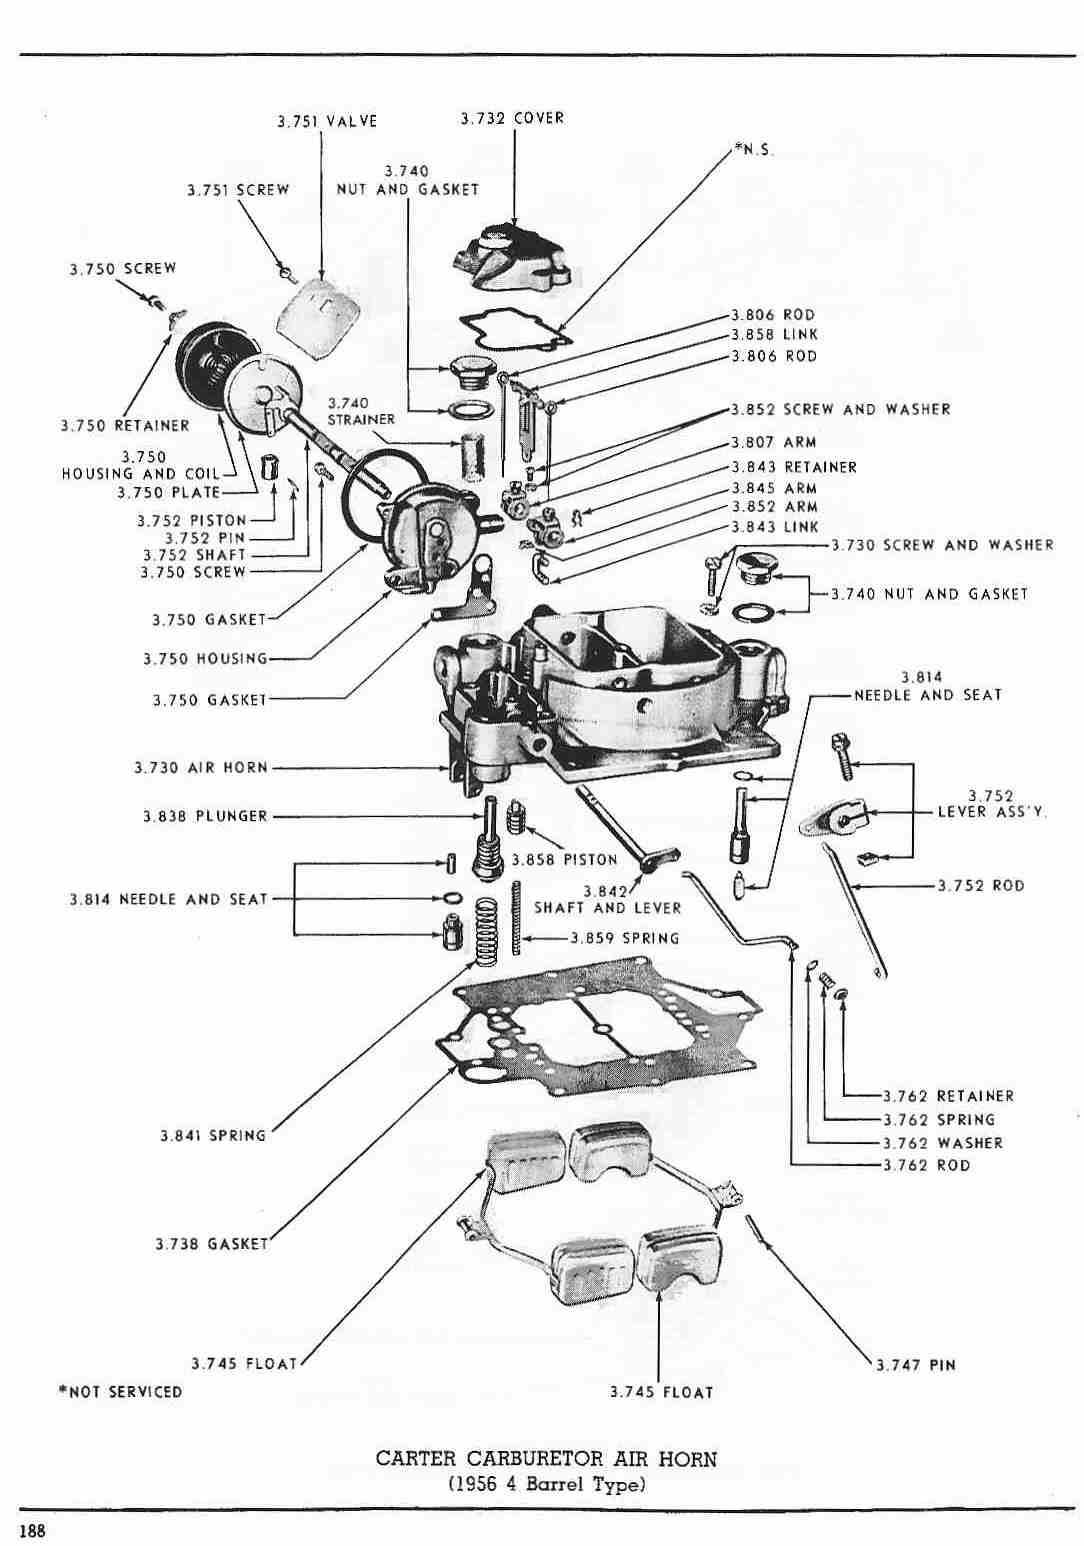 rochester 4 barrel carburetor diagram the book thief plot 2 carb free engine